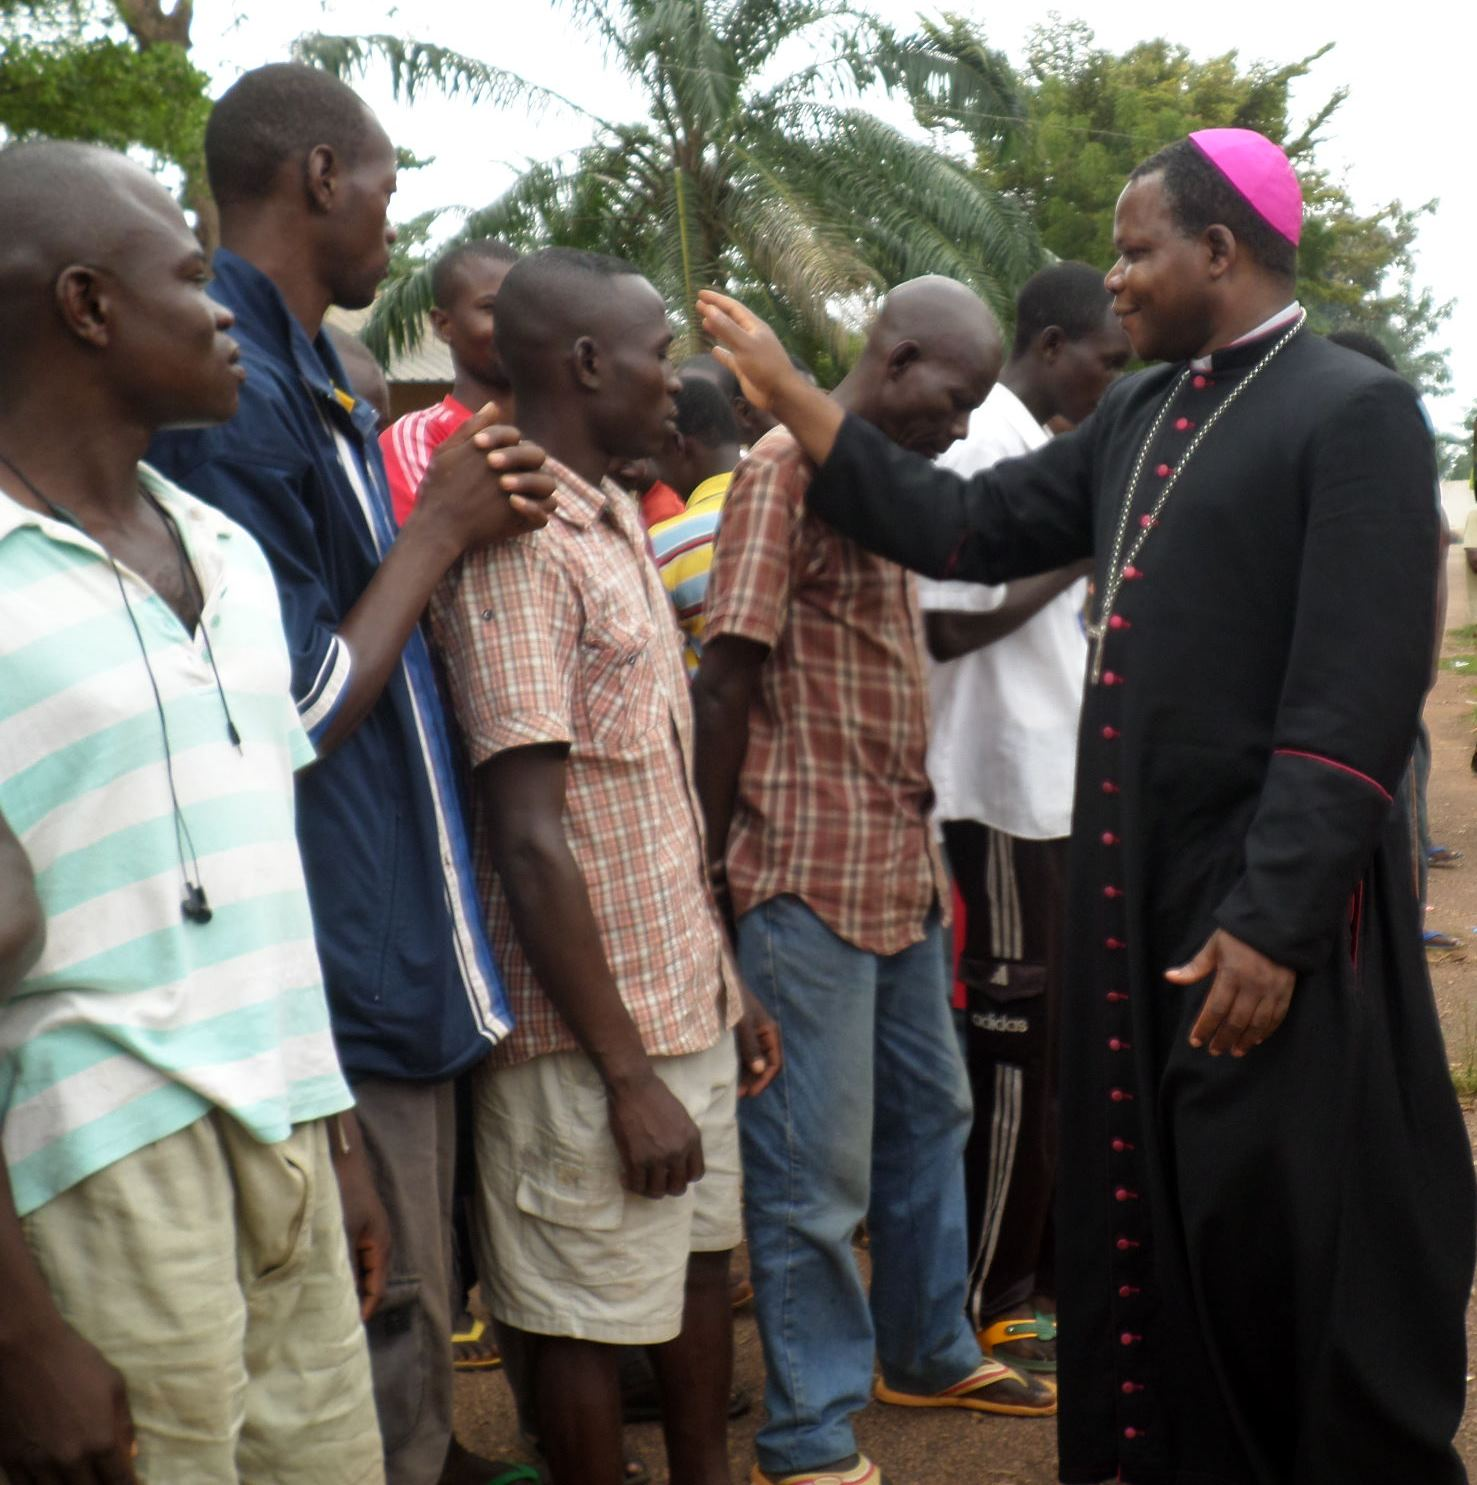 Visit of Archbishop Dieudonné Nzapalainga to Camp Beal